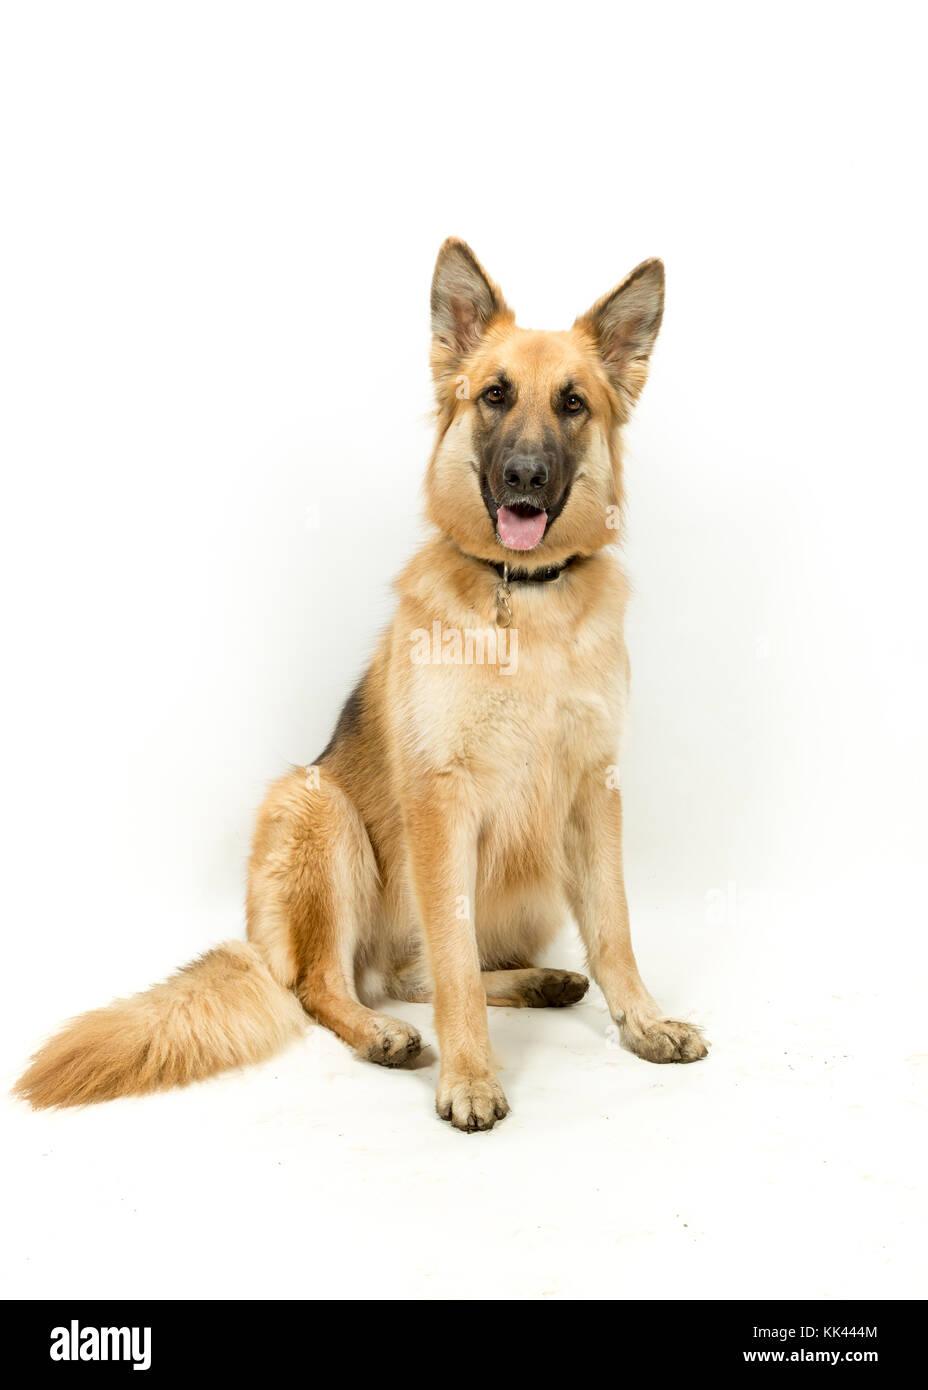 Golden Brown German Shepherd Alsatian Dog Sitting against White Background - Stock Image